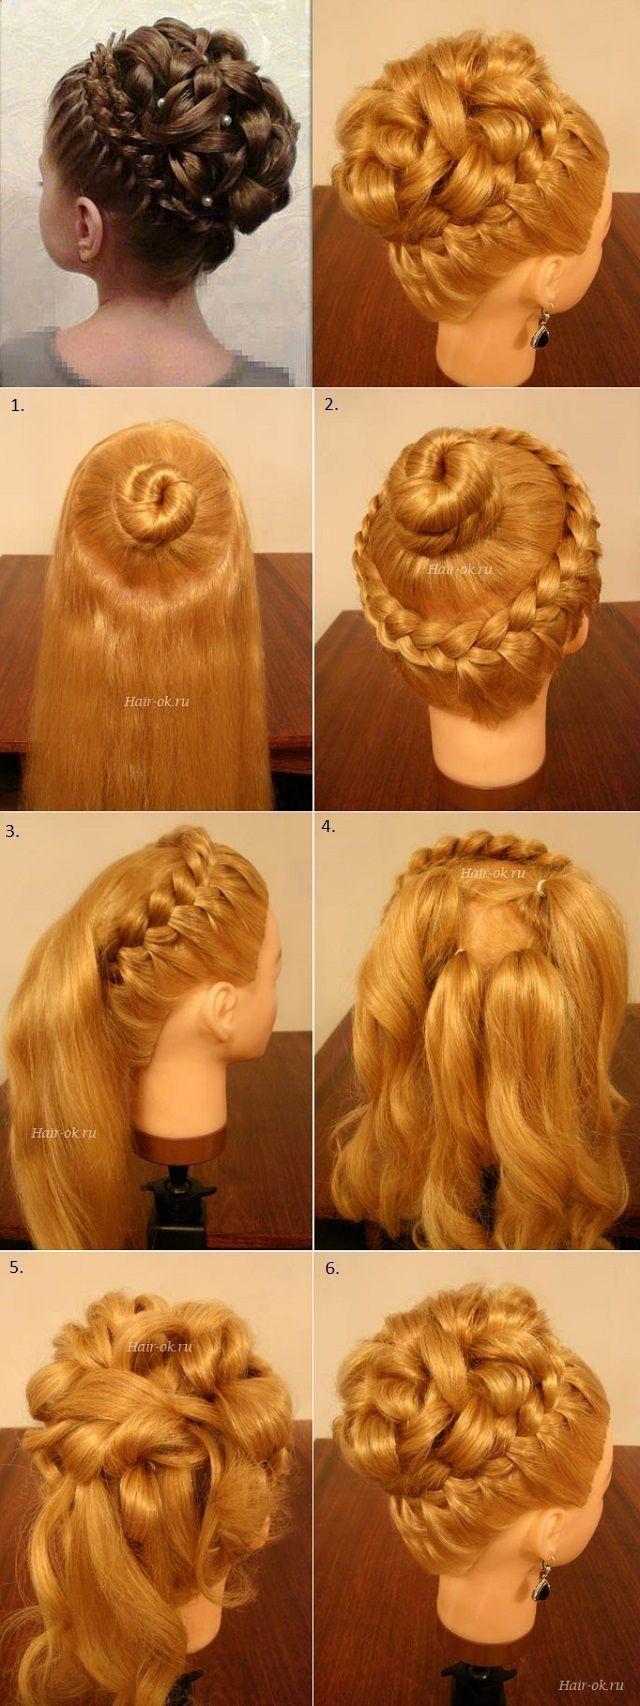 Elegant Braiding Hairstyle With Curls  DIY